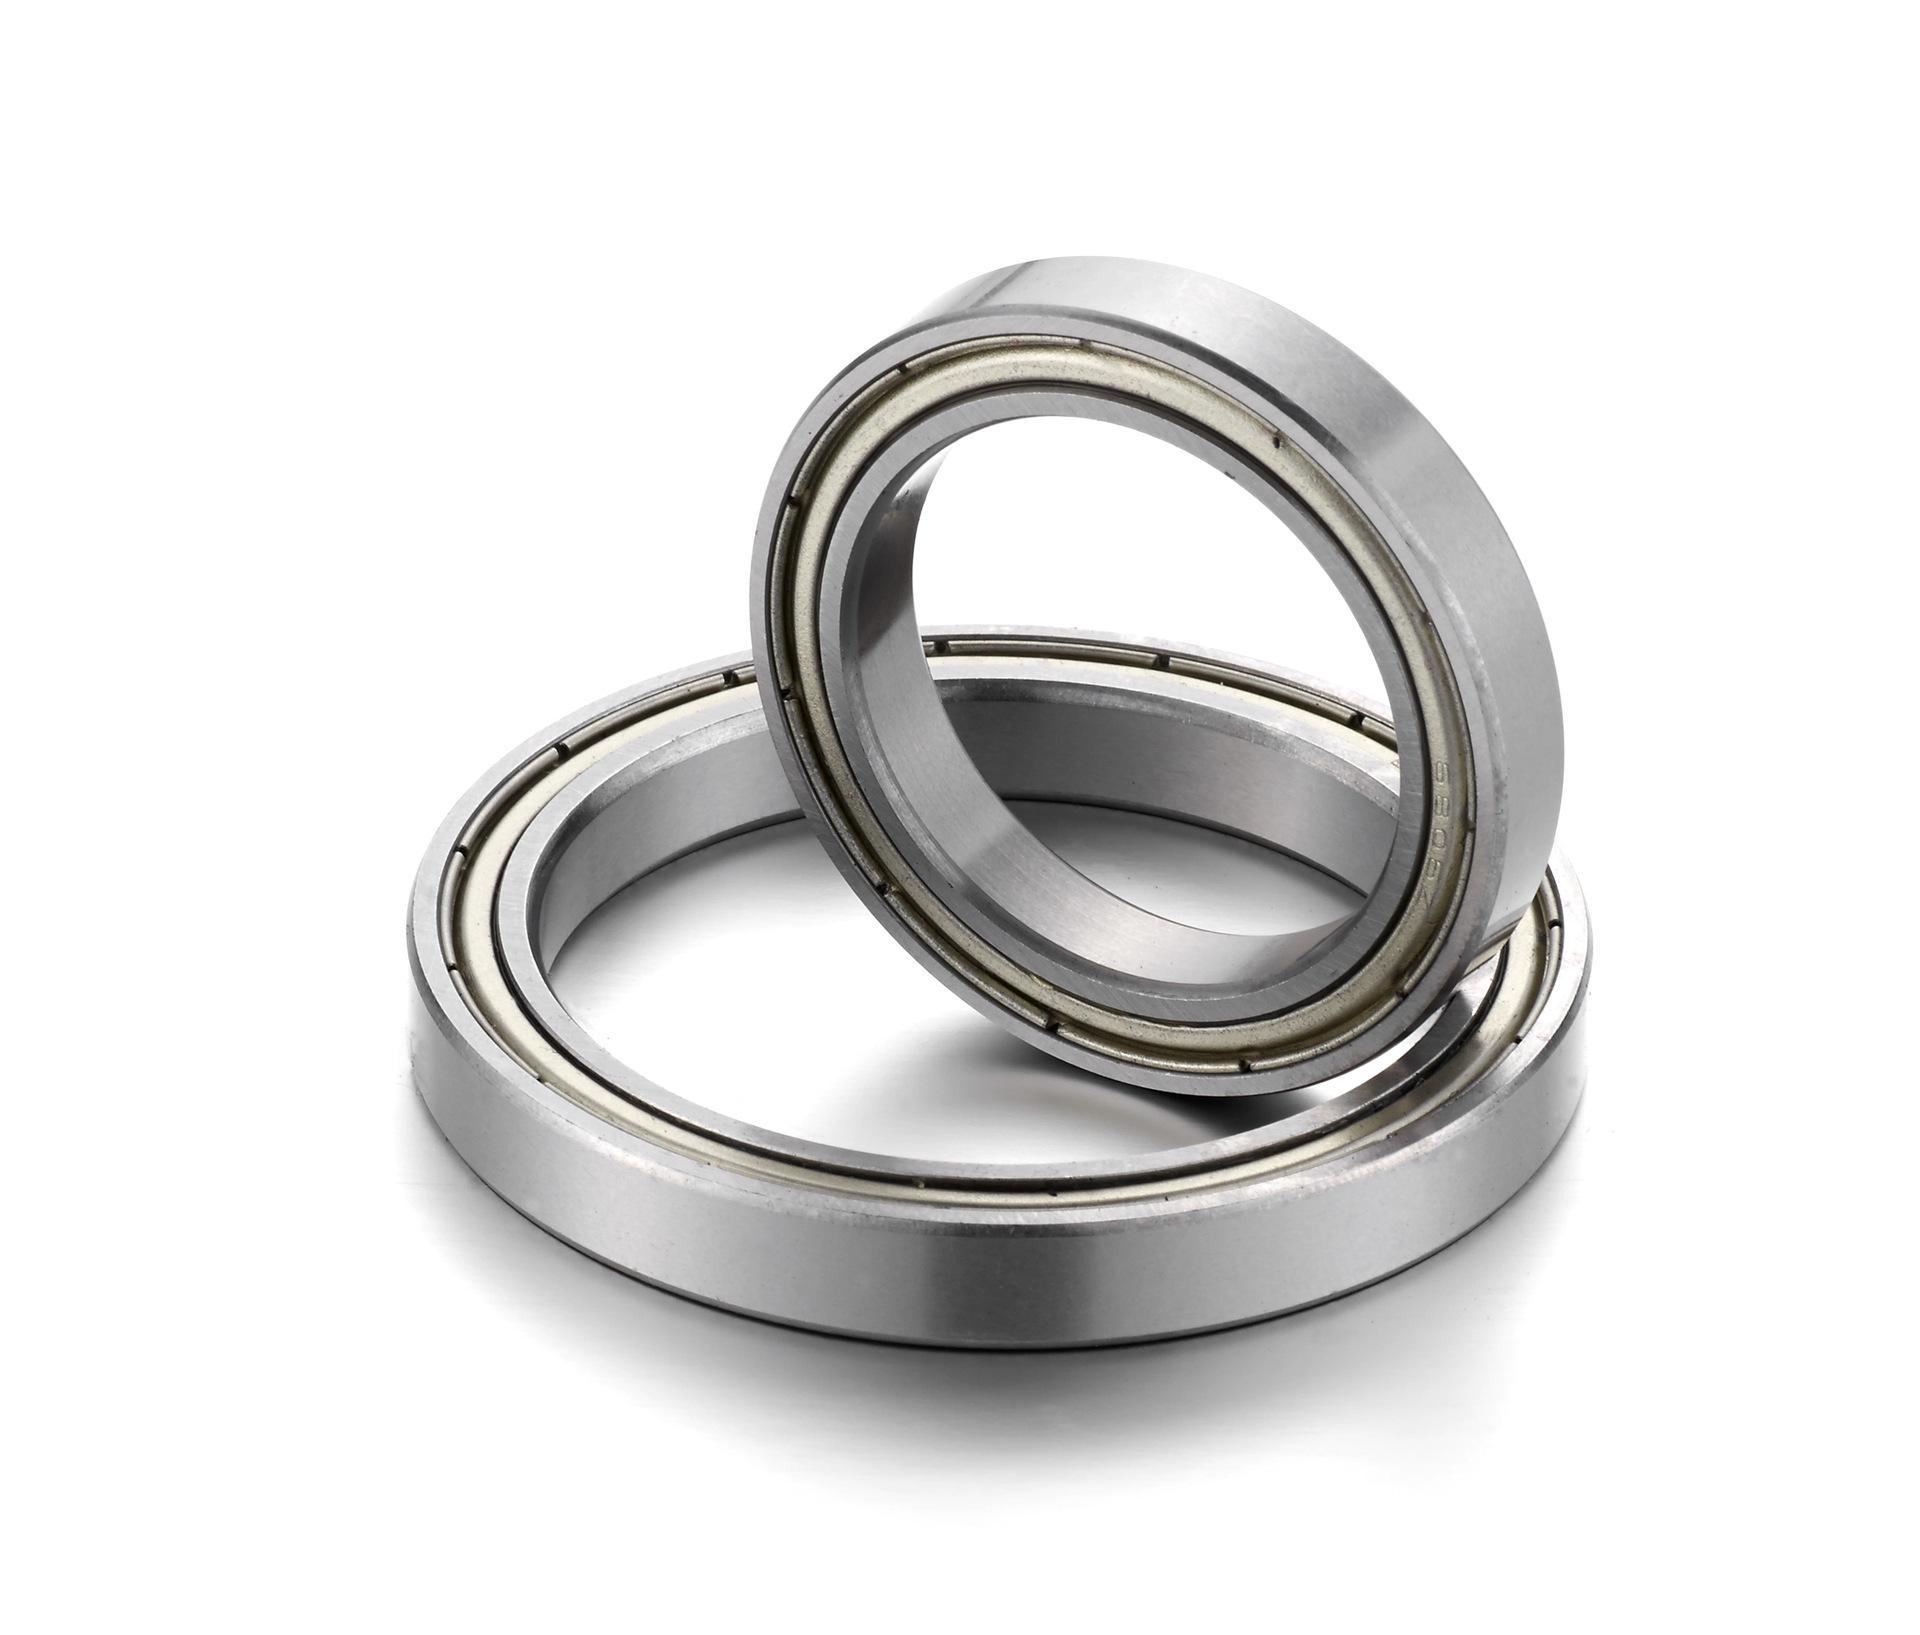 6832M ABEC-1  160x200x20MM  Metric Thin Section Bearings 61832M Brass cage 1pcs 71901 71901cd p4 7901 12x24x6 mochu thin walled miniature angular contact bearings speed spindle bearings cnc abec 7